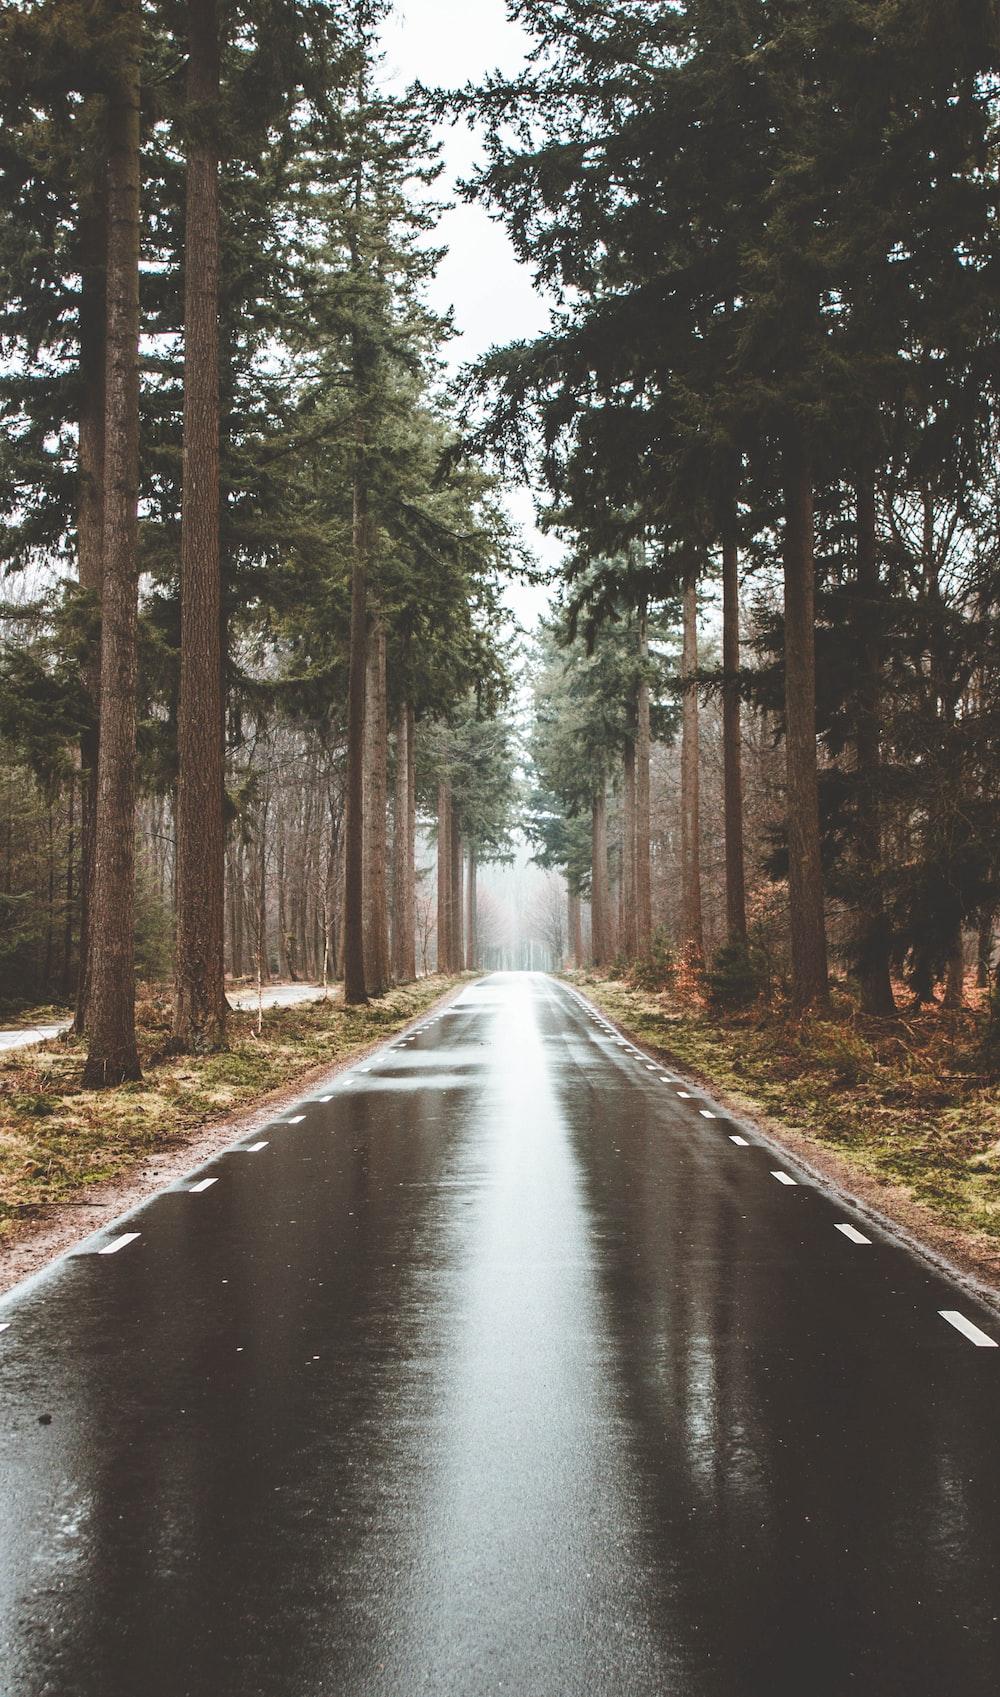 trees between road